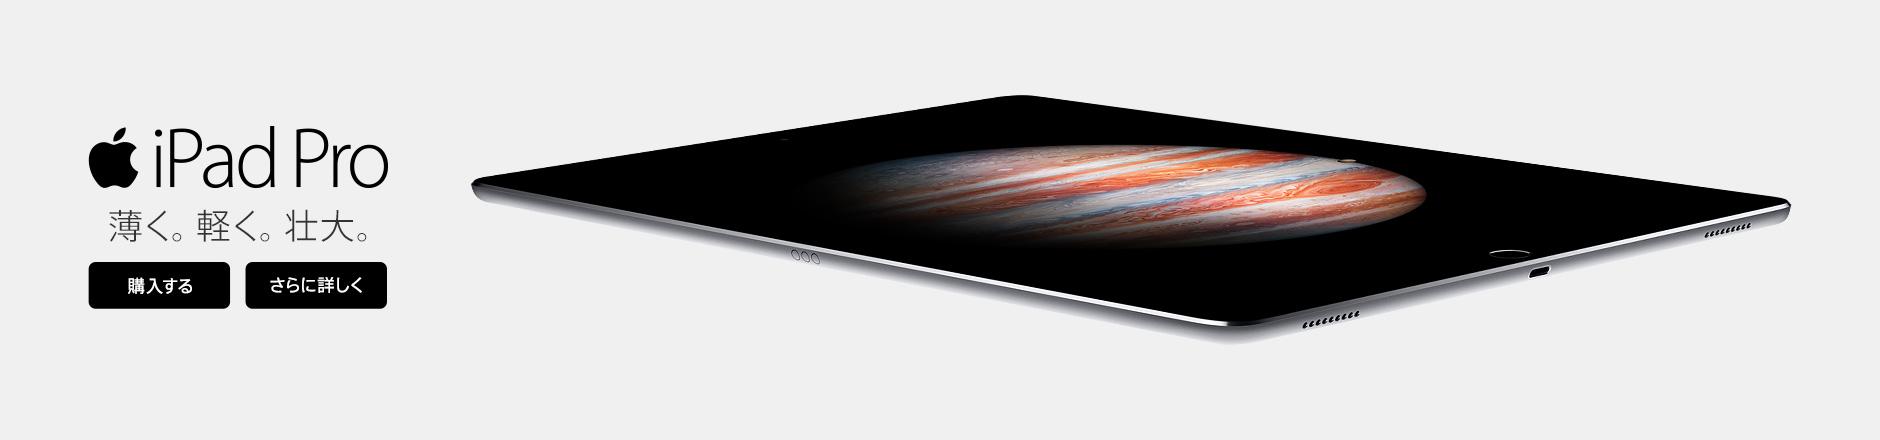 iPad Pro 薄く。軽く。壮大。